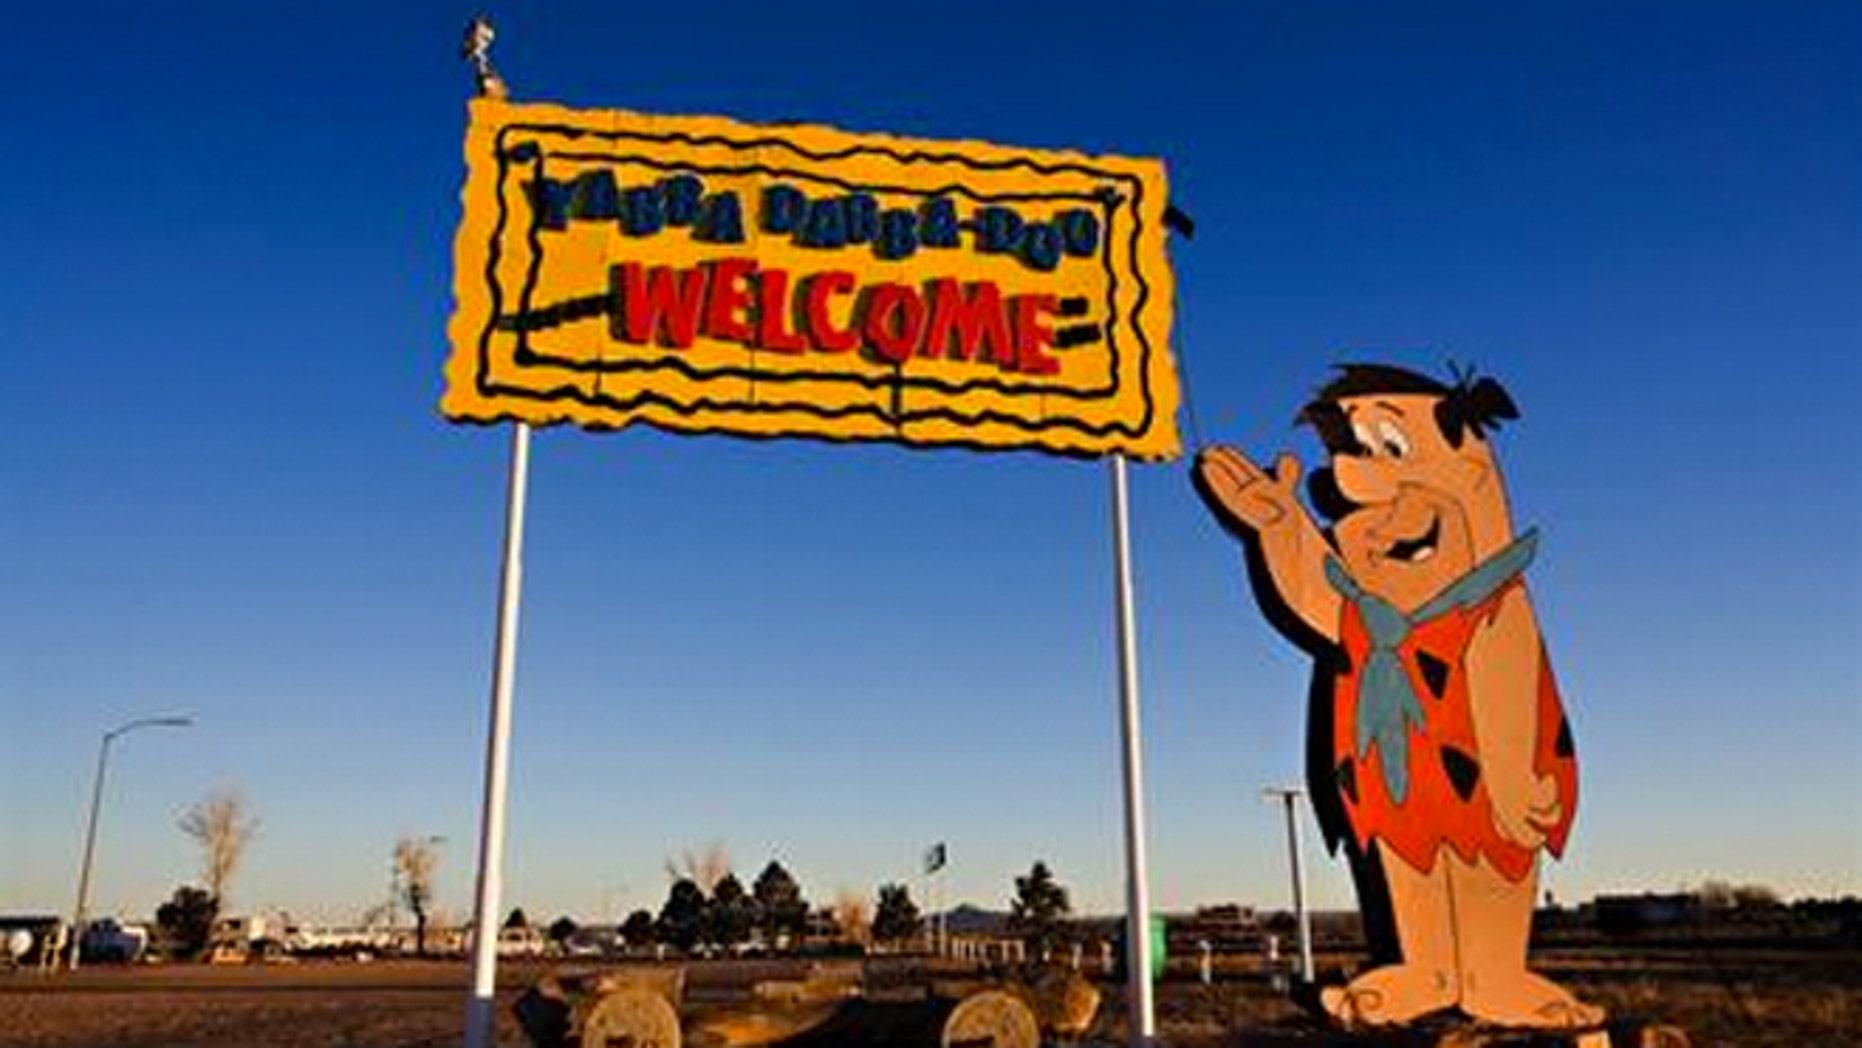 Fred Flintstone welcomes visitors to Bedrock City.